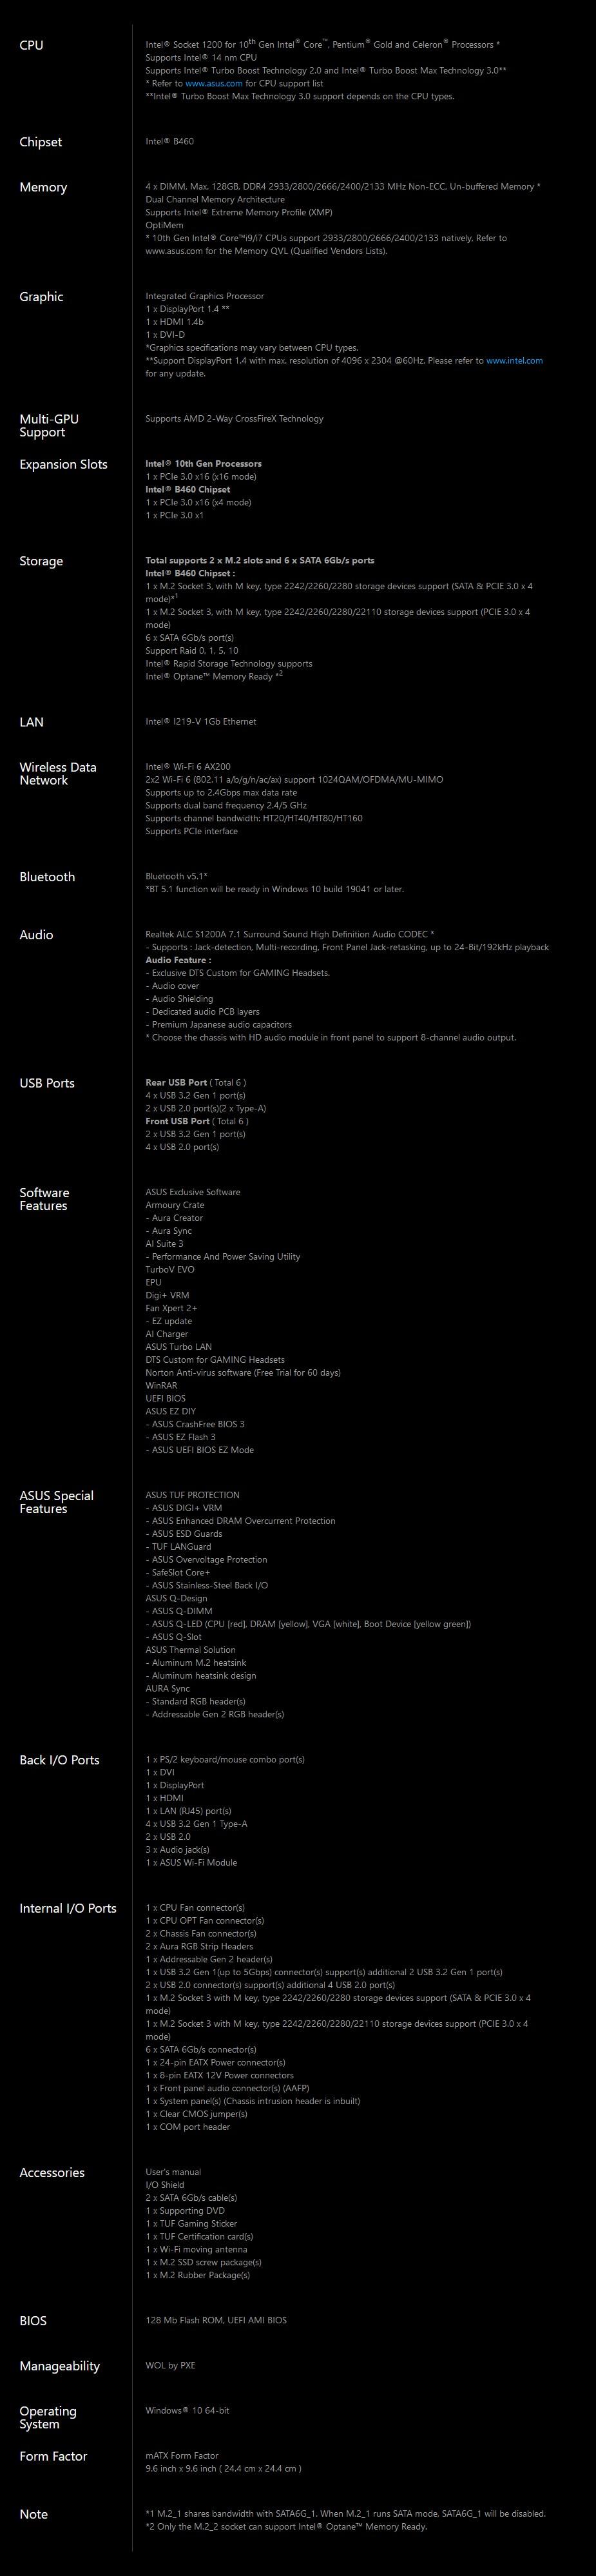 asus-tuf-gaming-b460mplus-wifi-lga-1200-microatx-motherboard-ac35254-9.jpg